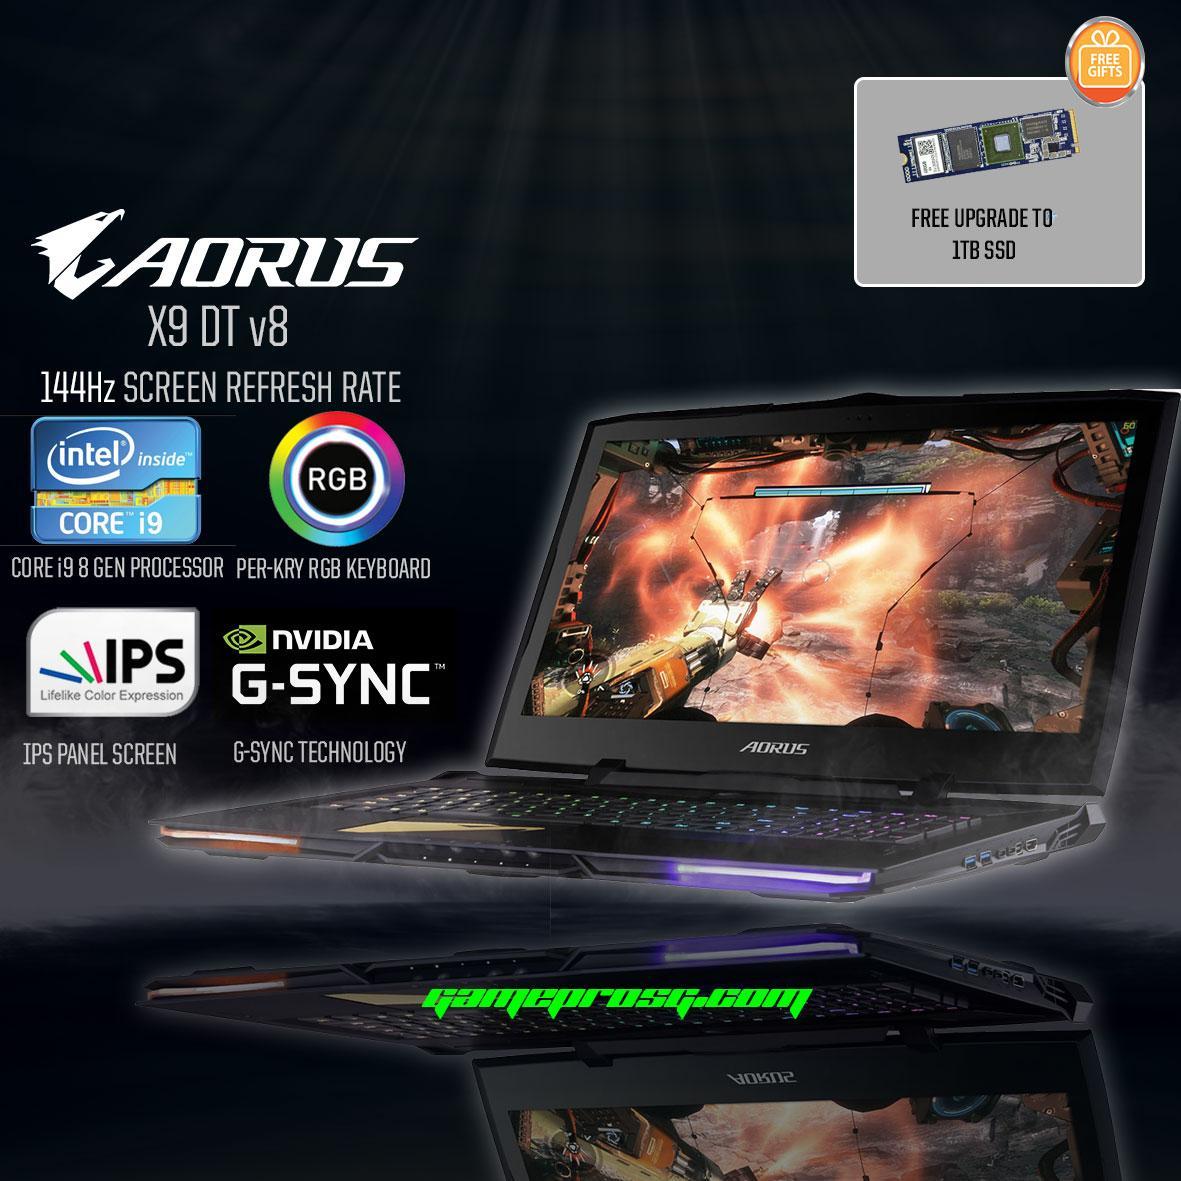 AORUS X9 DT v8 144Hz (i9-8th Gen GTX 1080 8GB GDDR5X) 17.3 Gaming Laptop